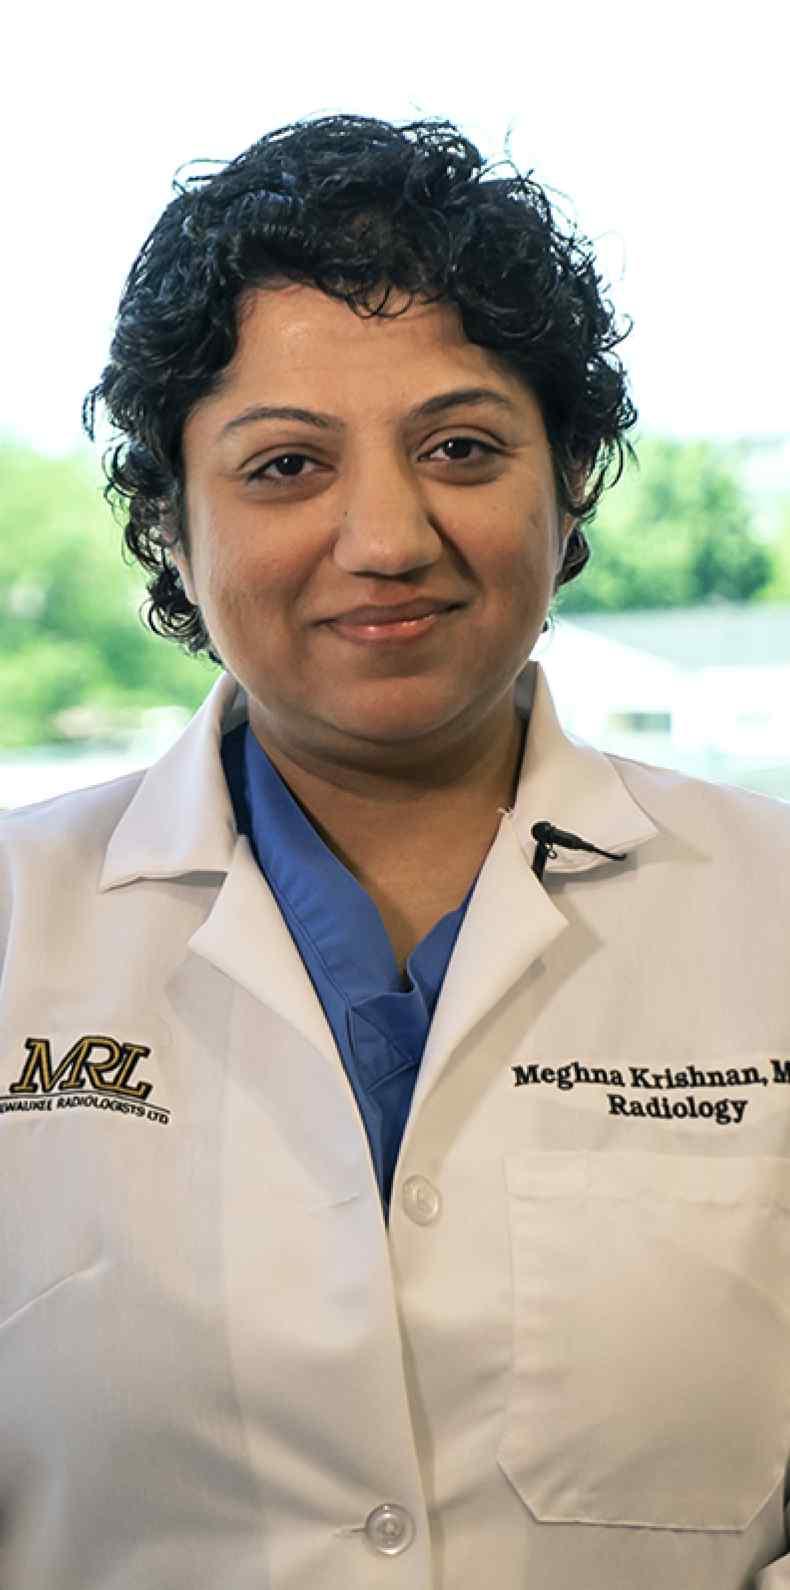 Meghna Krishnan M.D.